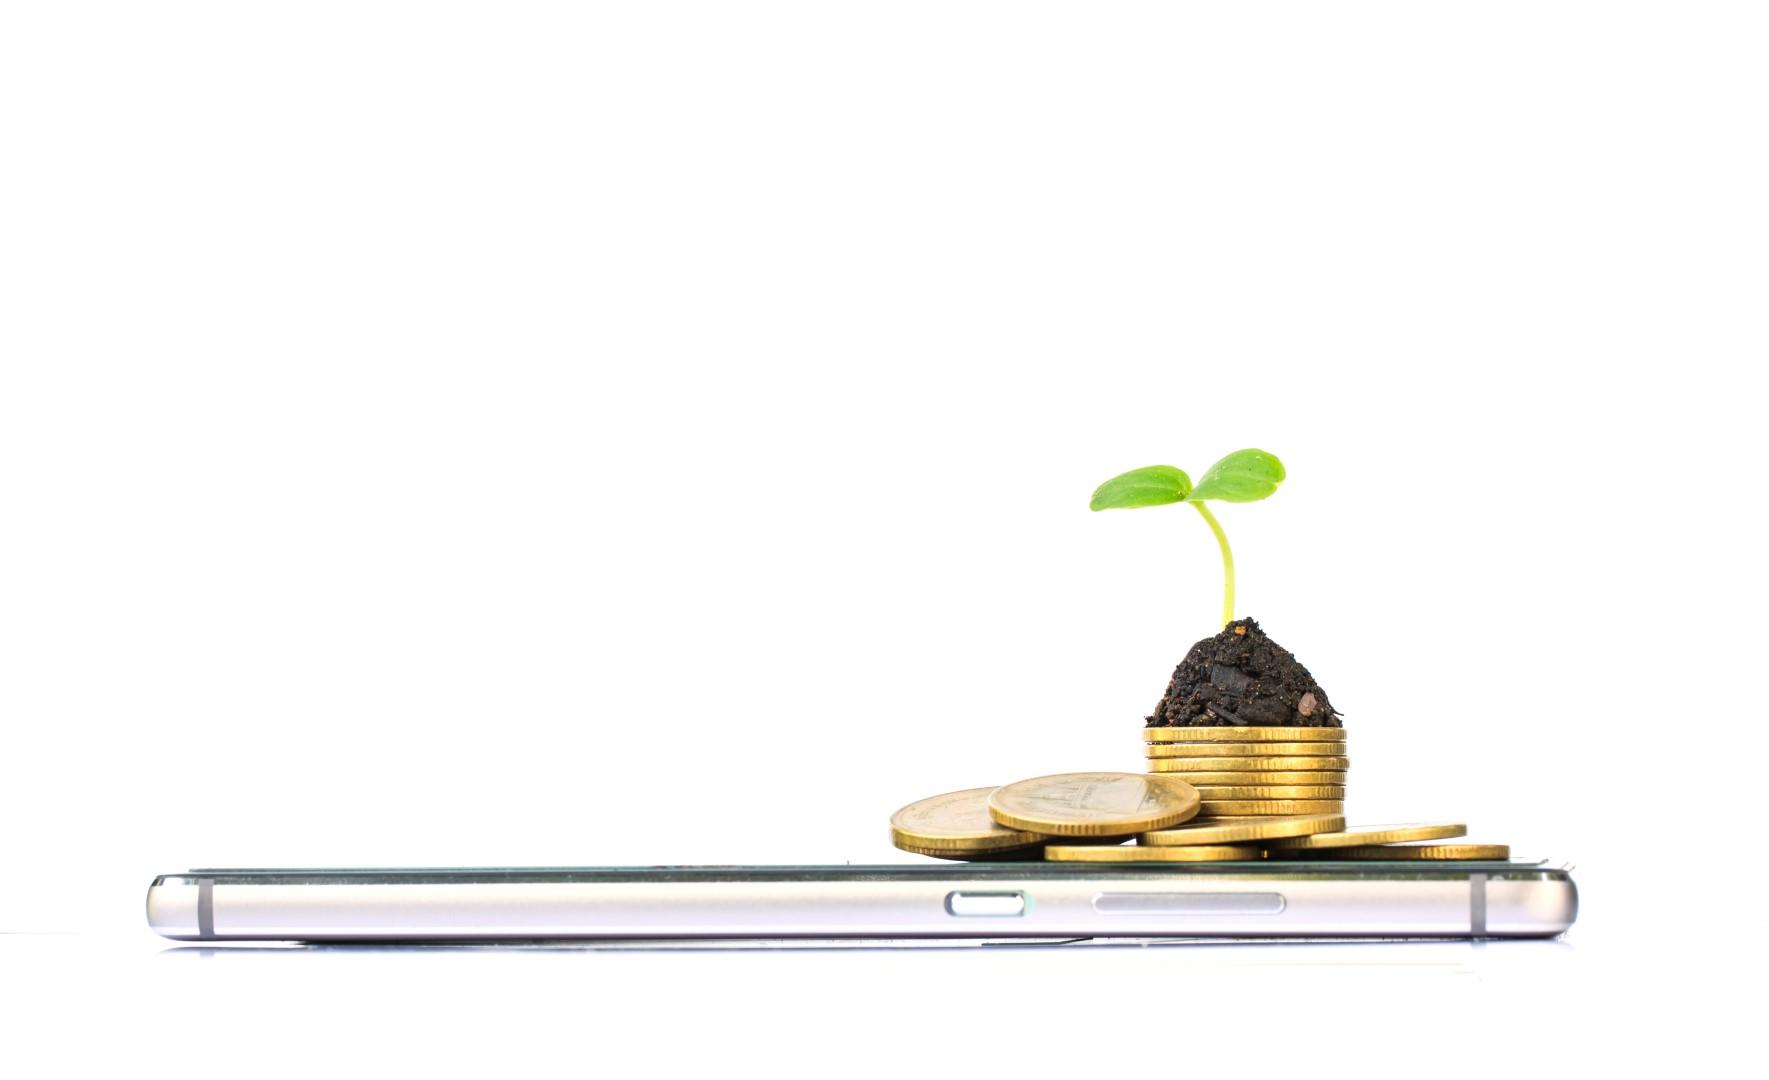 Exide Life Insurance launches Exide Life Star Saver, a savings-cum-insurance plan